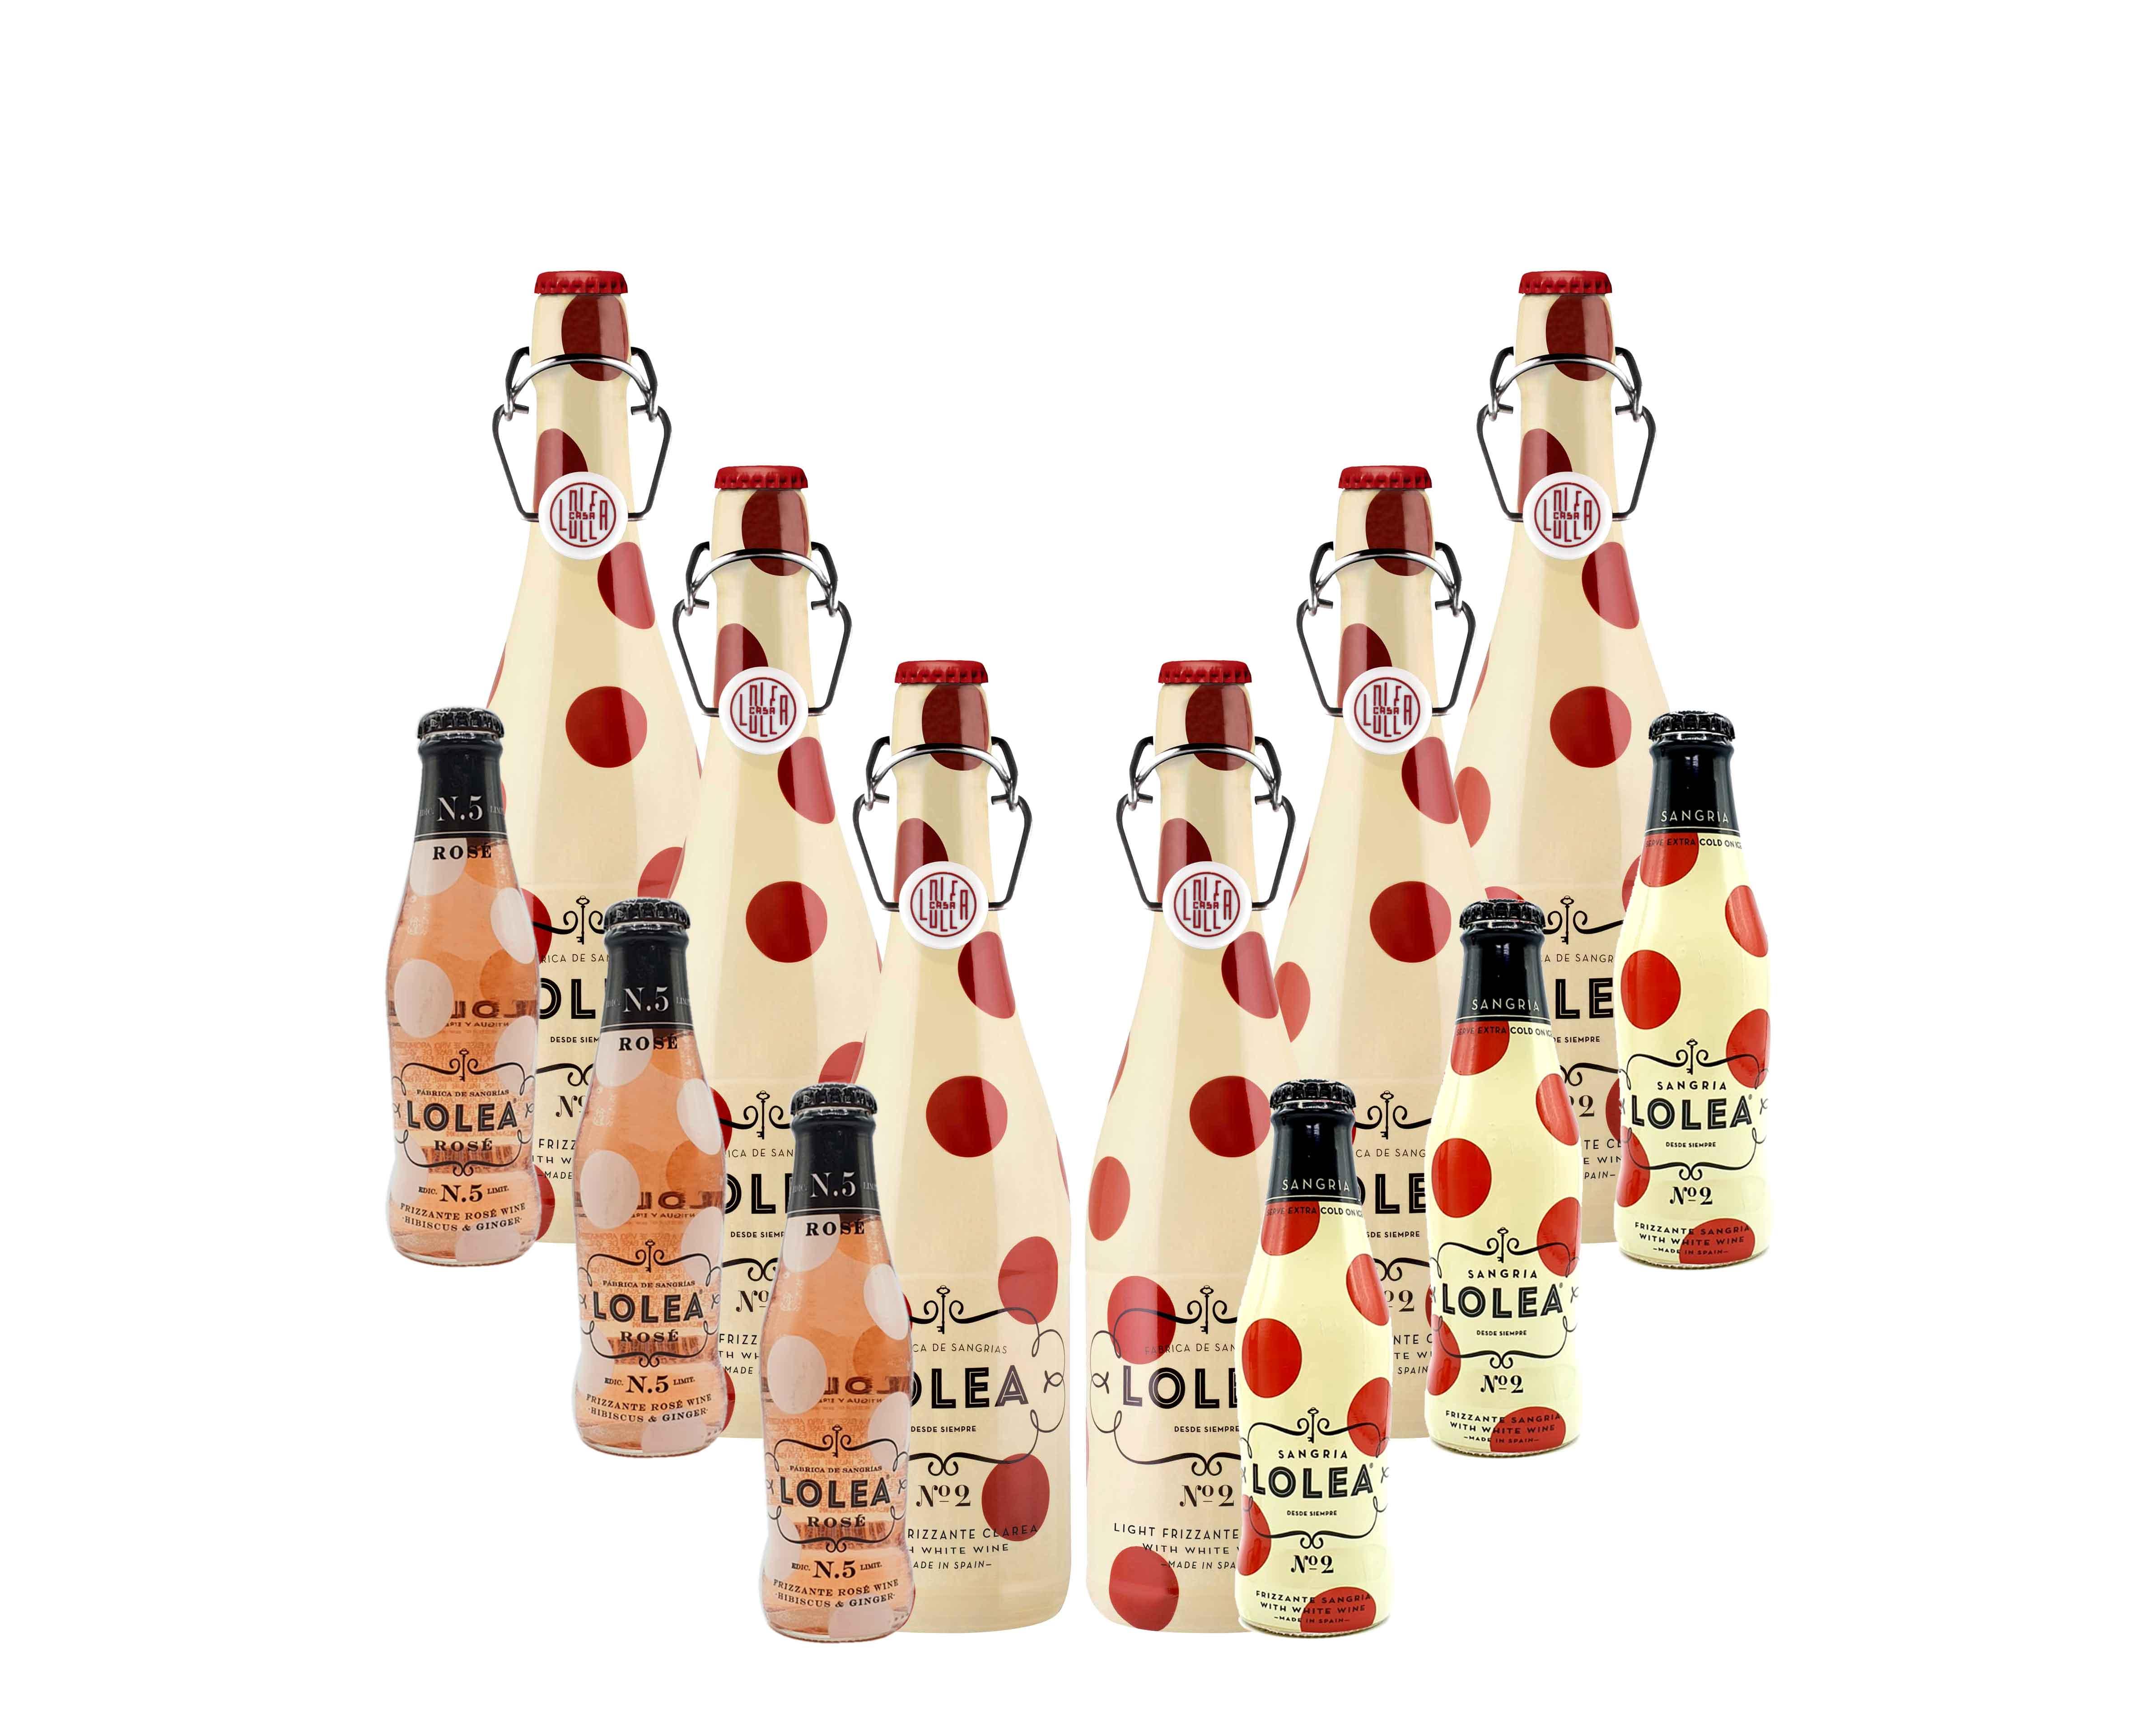 Lolea 6er Set Sangria N°2 WEIß 0,75L (7% Vol) 6x Weißwein Sangria Chardonnay + 6 Minis GRATIS 3x ROSE 0,2L (8% Vol) 3x WEIß 0,2L (7% Vol)- [Enthält Sulfite]